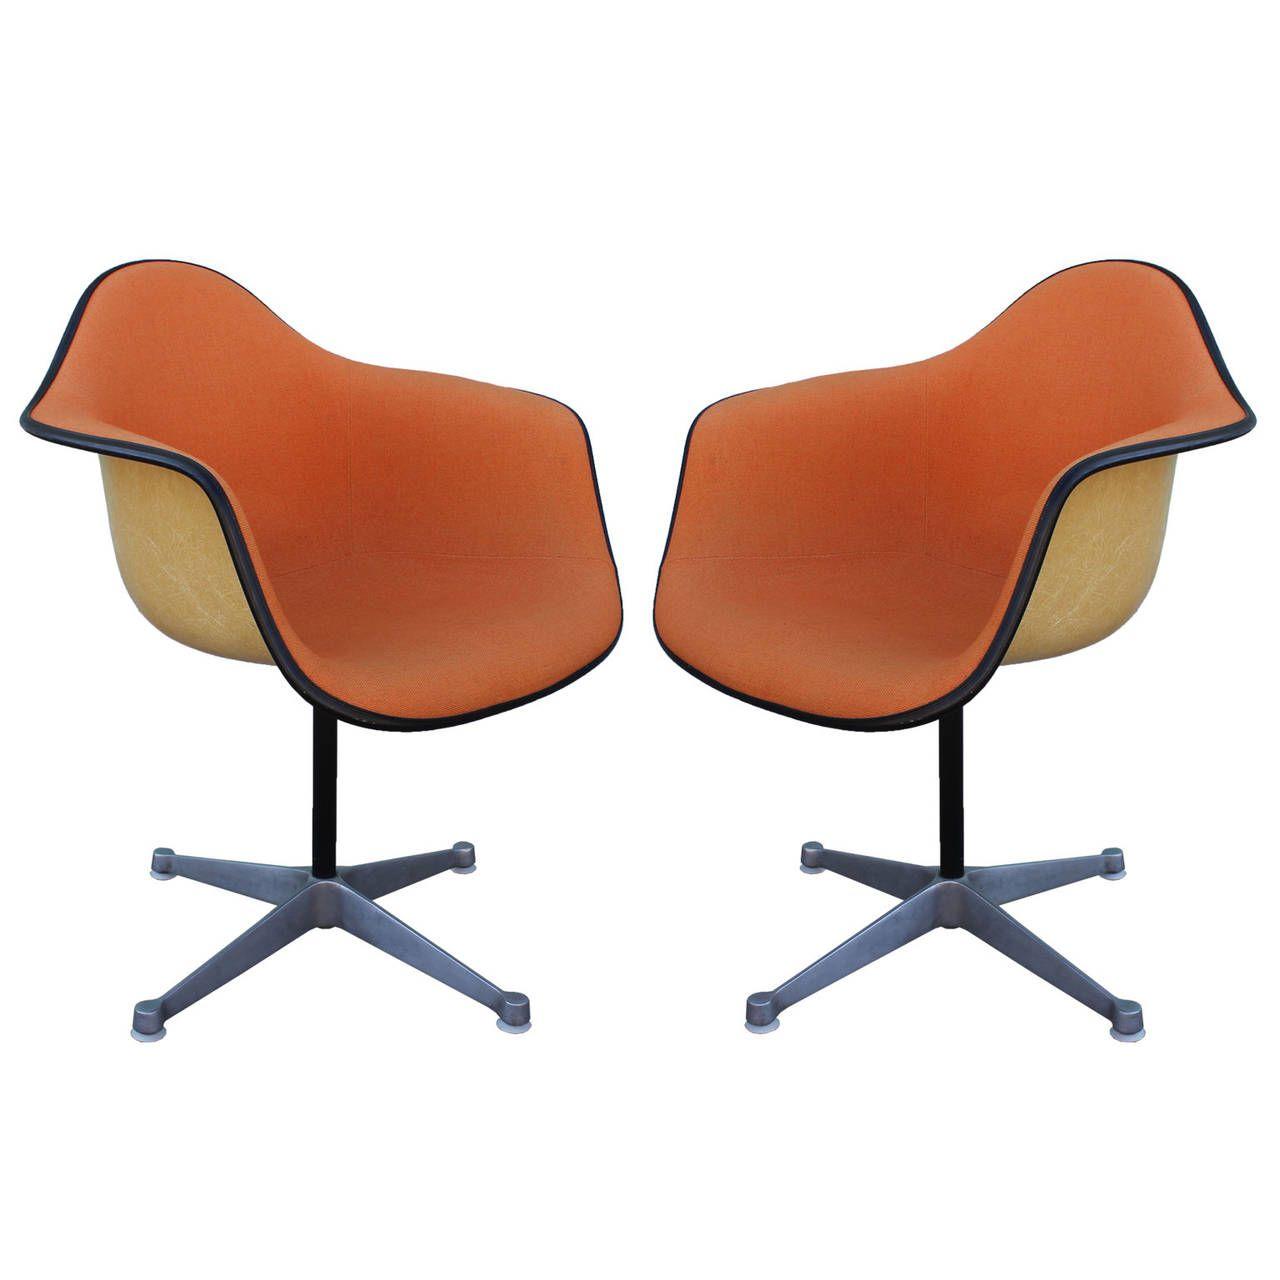 Pleasant Pair Of Herman Miller Eames Swivel Bucket Chairs Mid Customarchery Wood Chair Design Ideas Customarcherynet